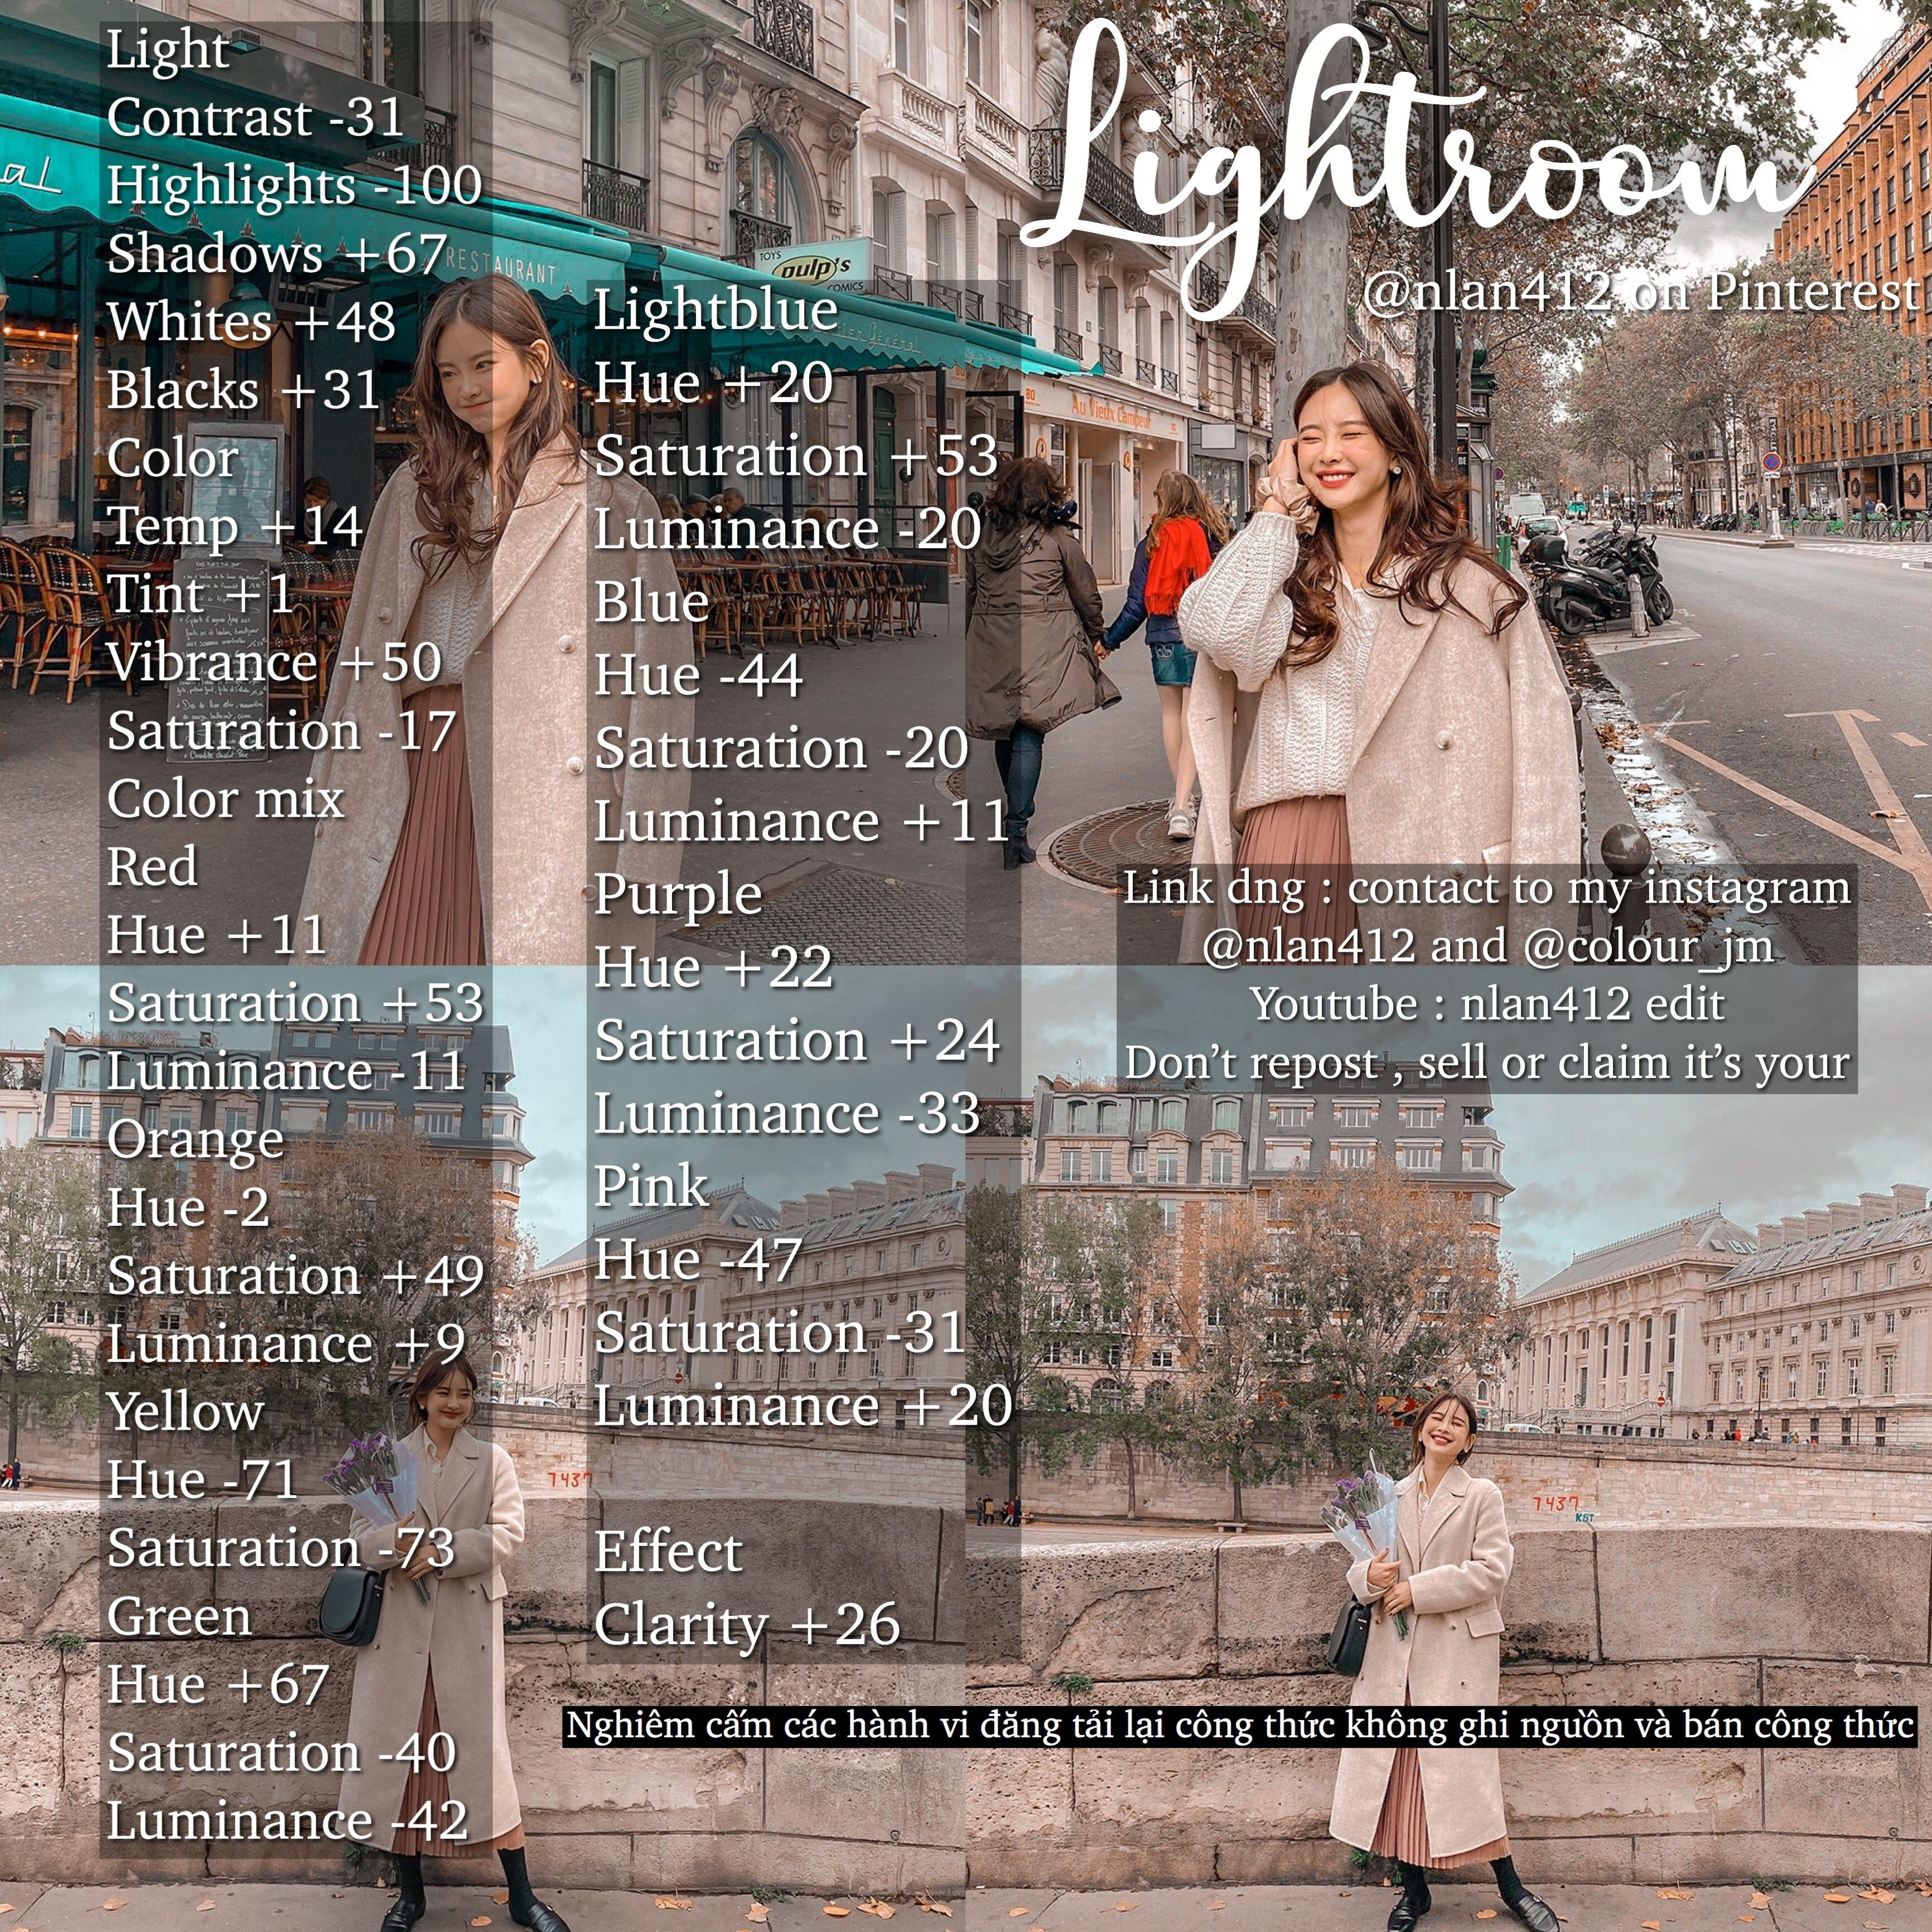 Lightroom Save Follow Me In 2020 Lightroom Tutorial Photo Editing Lightroom Editing Tutorials Lightroom Presets Tutorial